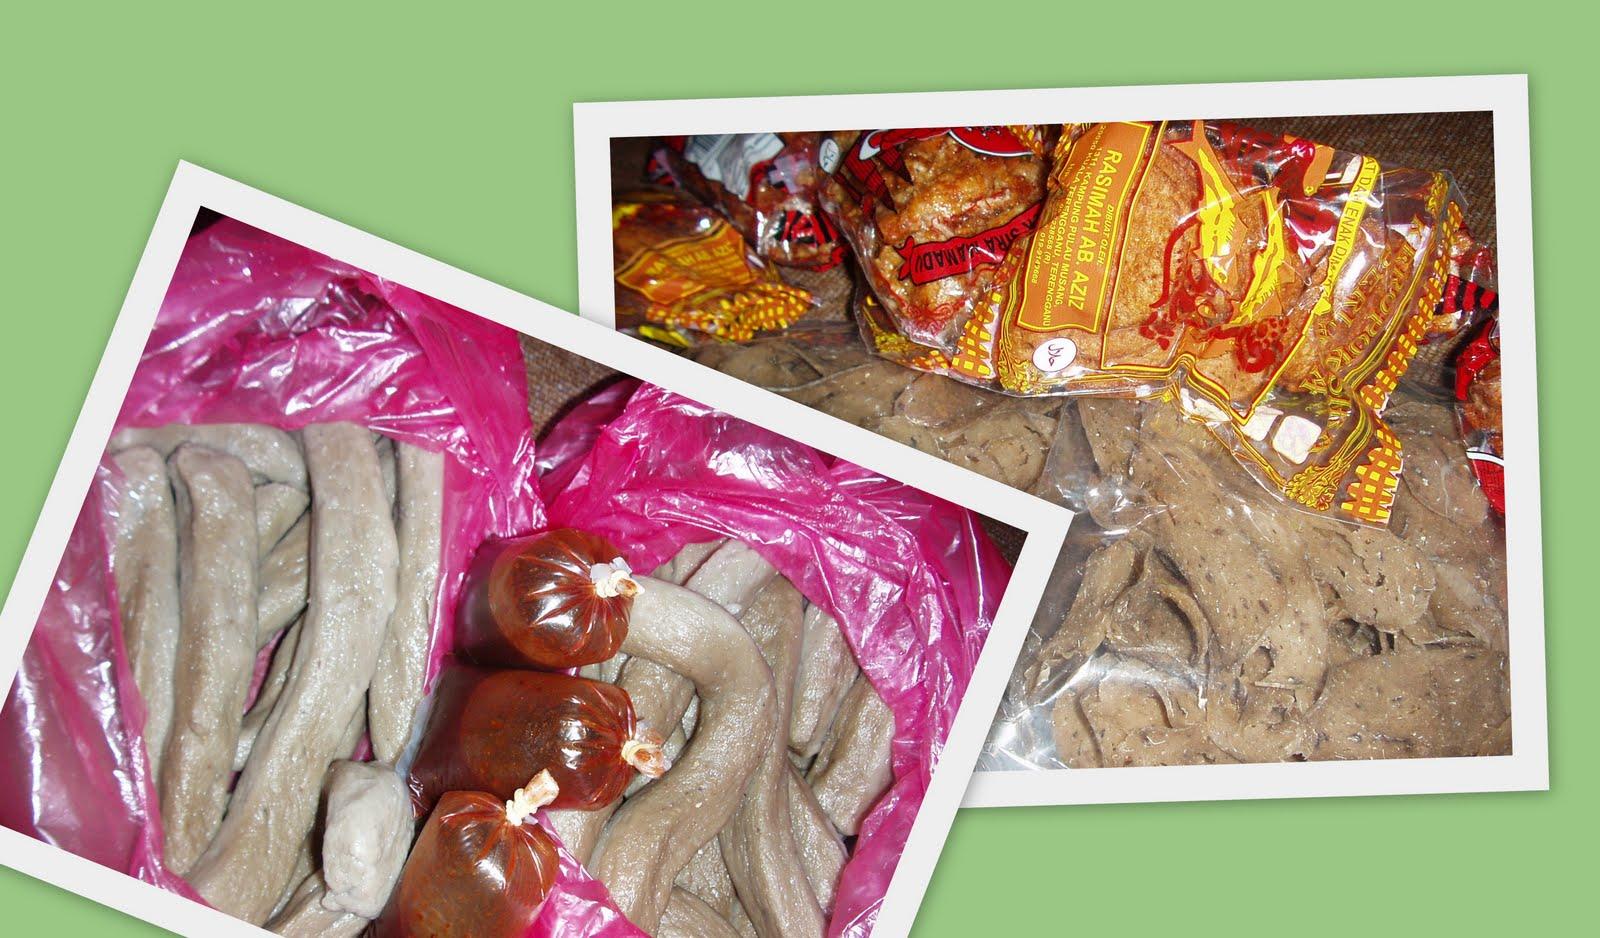 Disebalik Lens Kehidupan July 2010 Bawang Dayak Segar Setengah Kilo Ole Dari Ganubuat Org Kampungfamily Aku Jer